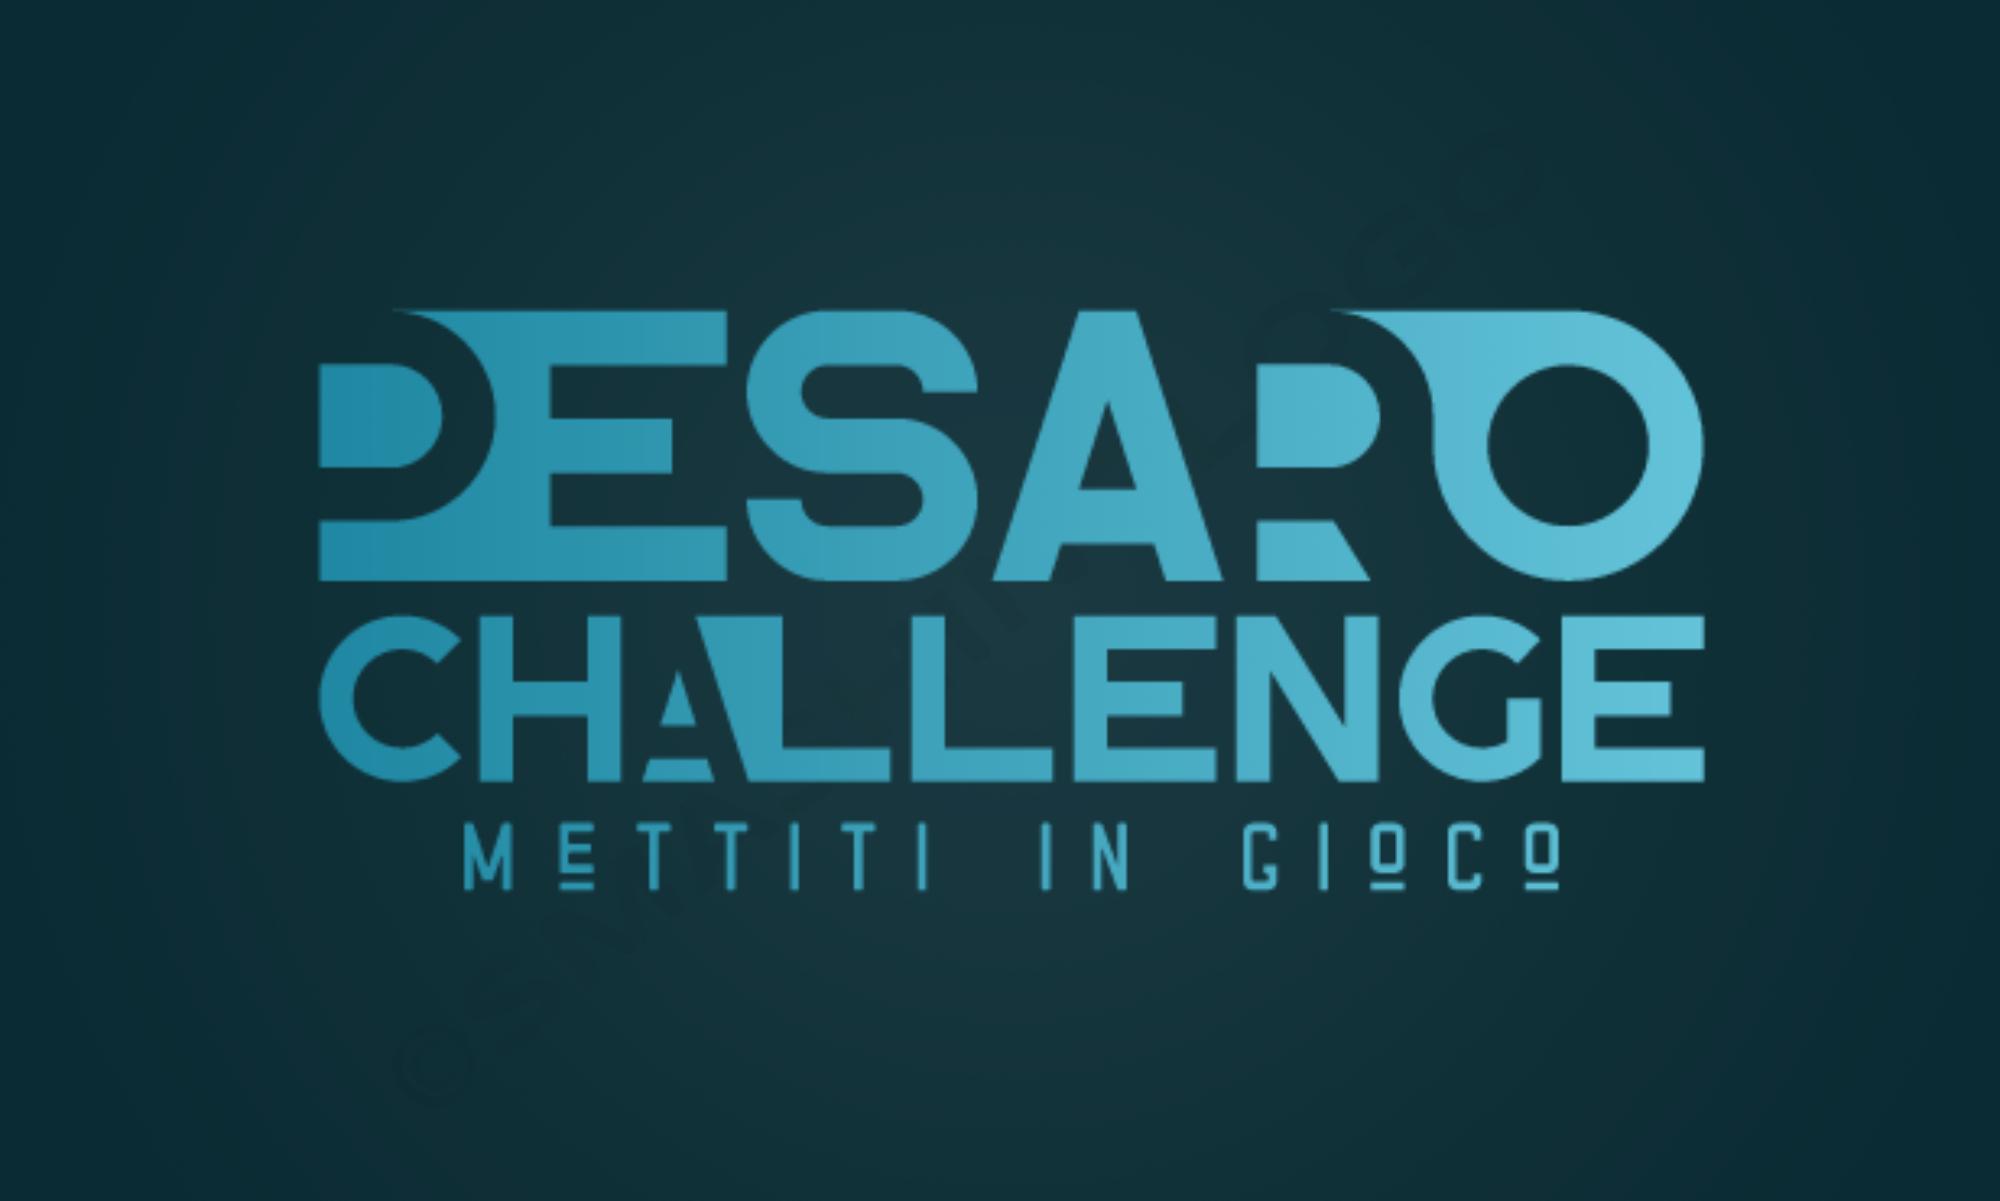 Pesaro challenge